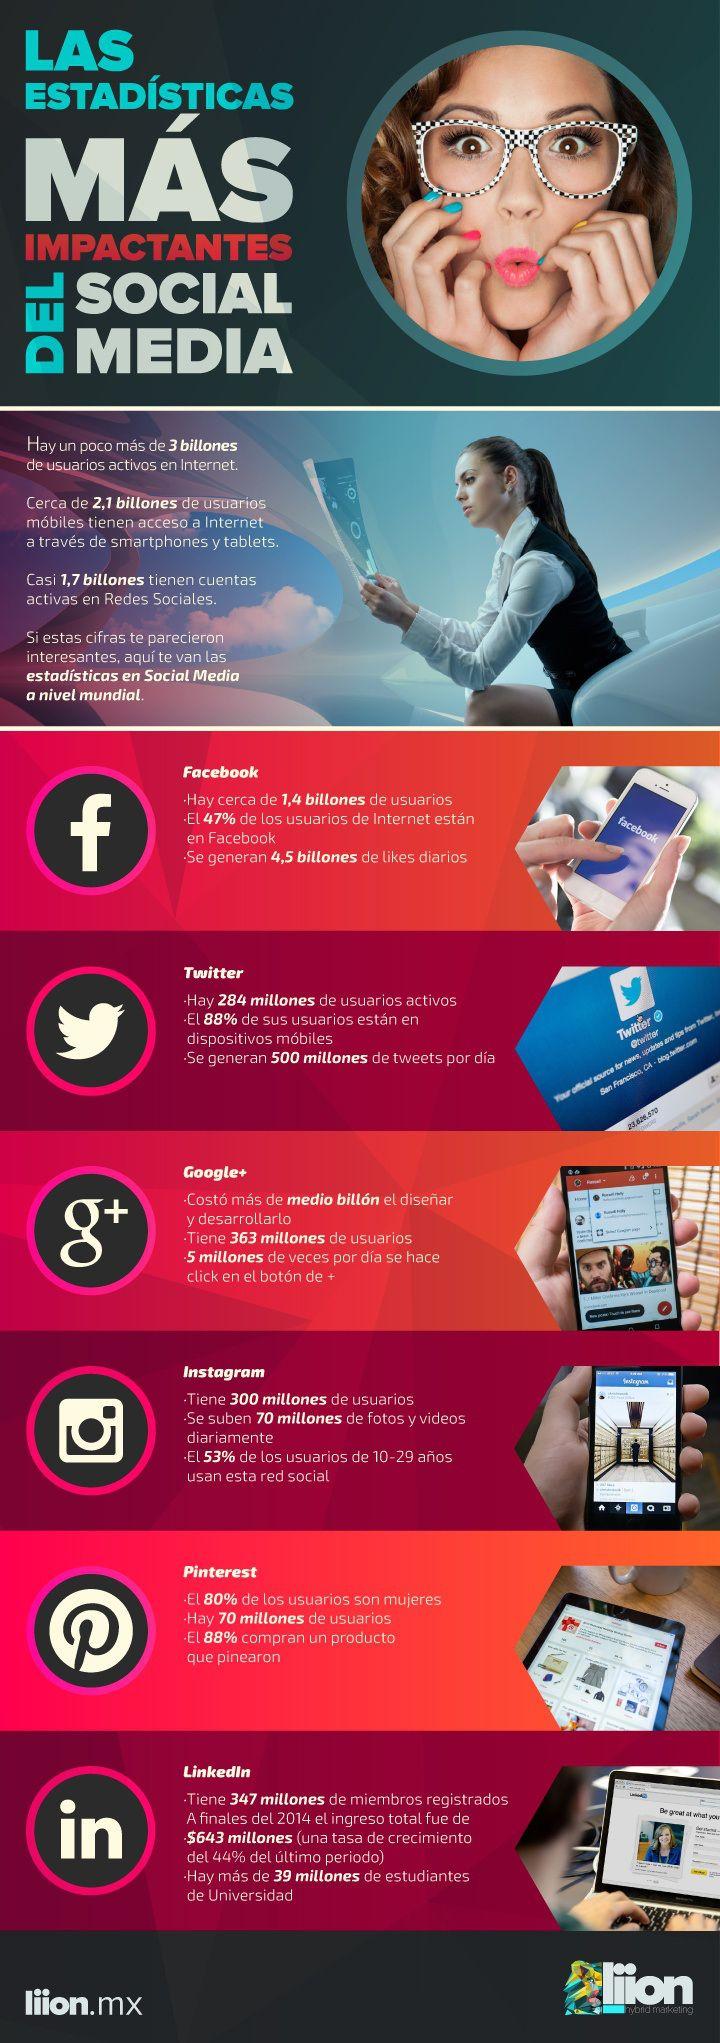 Estadísticas impactantes de las Redes Sociales #infografia #infographic #socialmedia